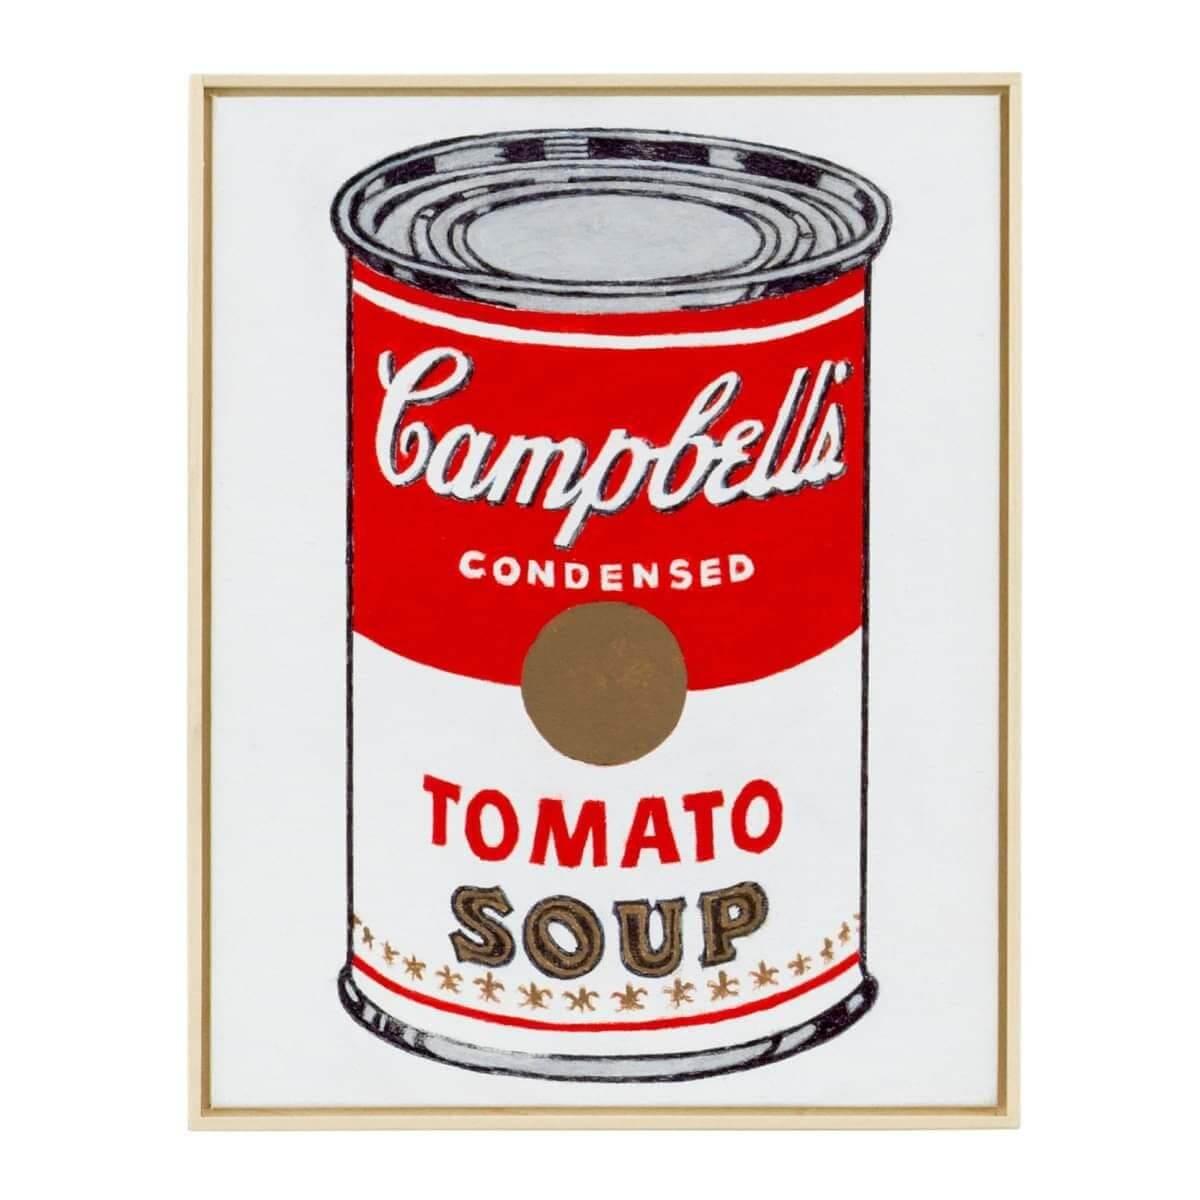 Andy Warhol 以日常生活為靈感,創作經典金寶湯Pop Art。